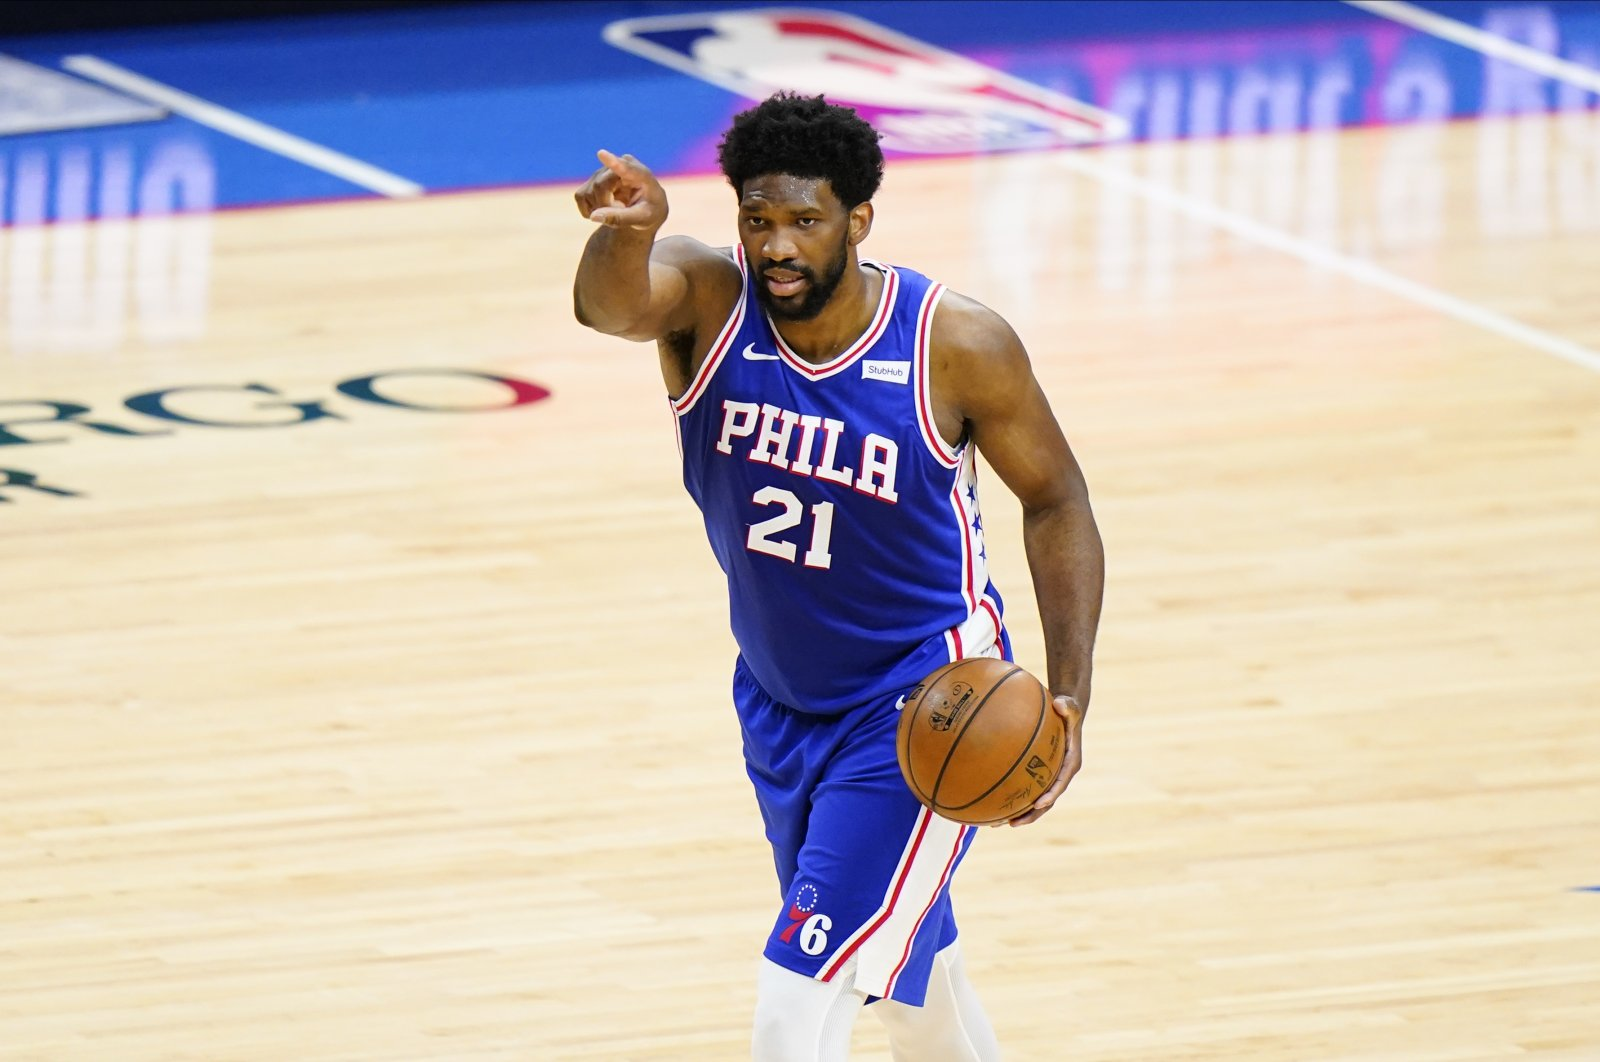 Philadelphia 76ers' Joel Embiid plays during Game 2 in a second-round NBA basketball playoff series against the Atlanta Hawks, Philadelphia, U.S., June 8, 2021. (AP Photo)